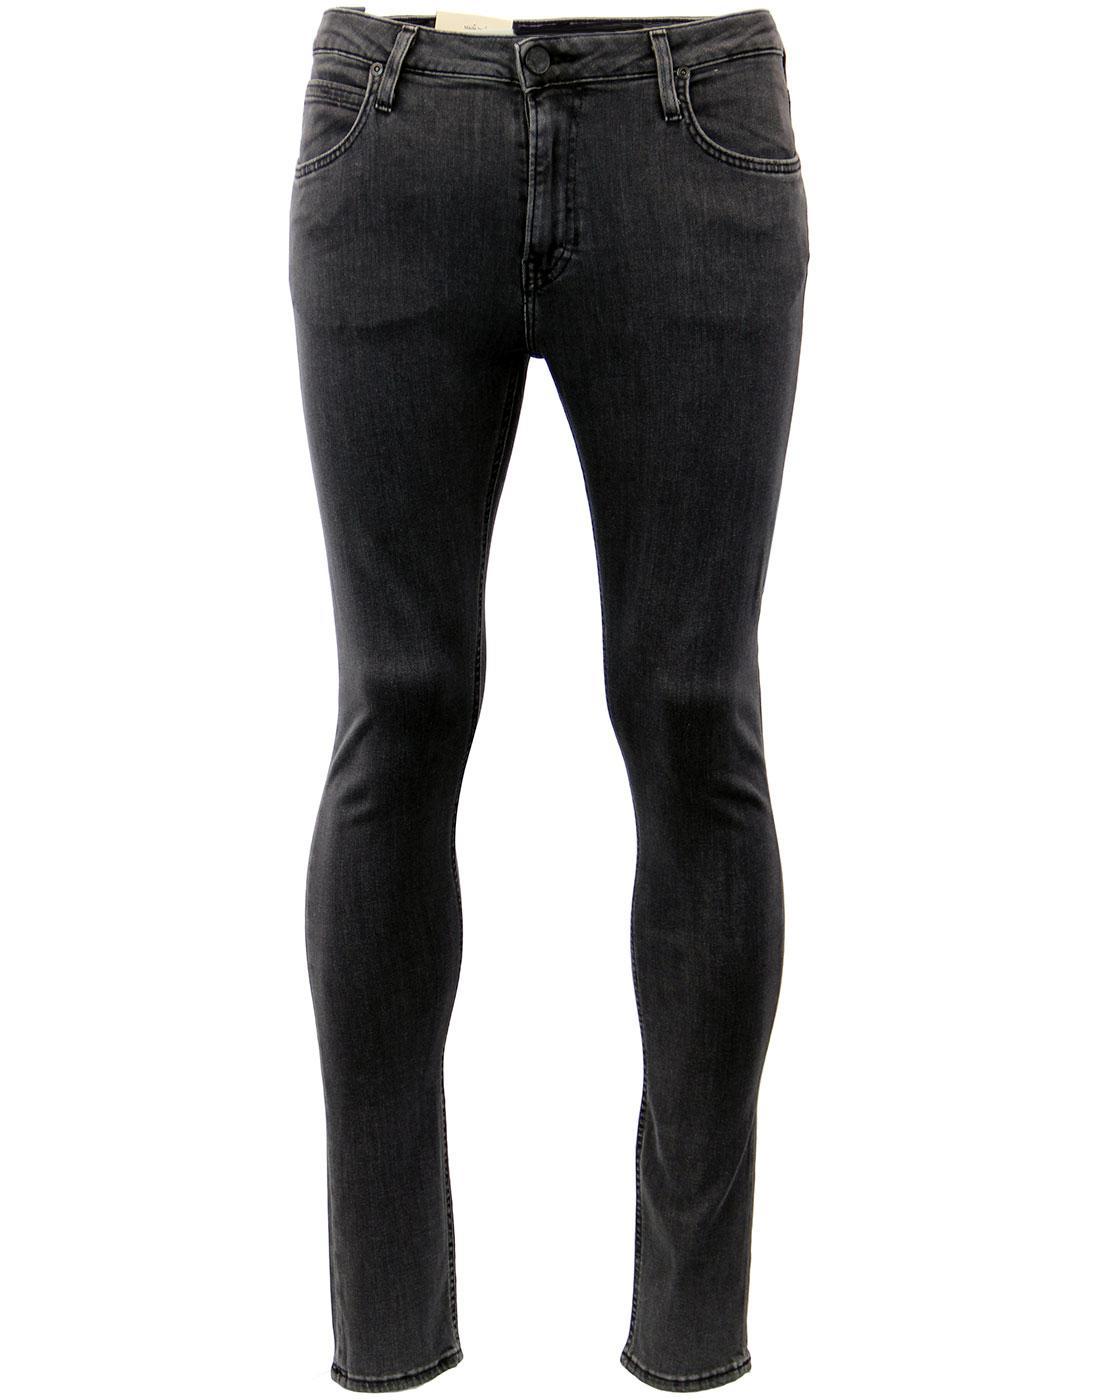 Malone LEE Retro Indie Mod Skinny Denim Jeans